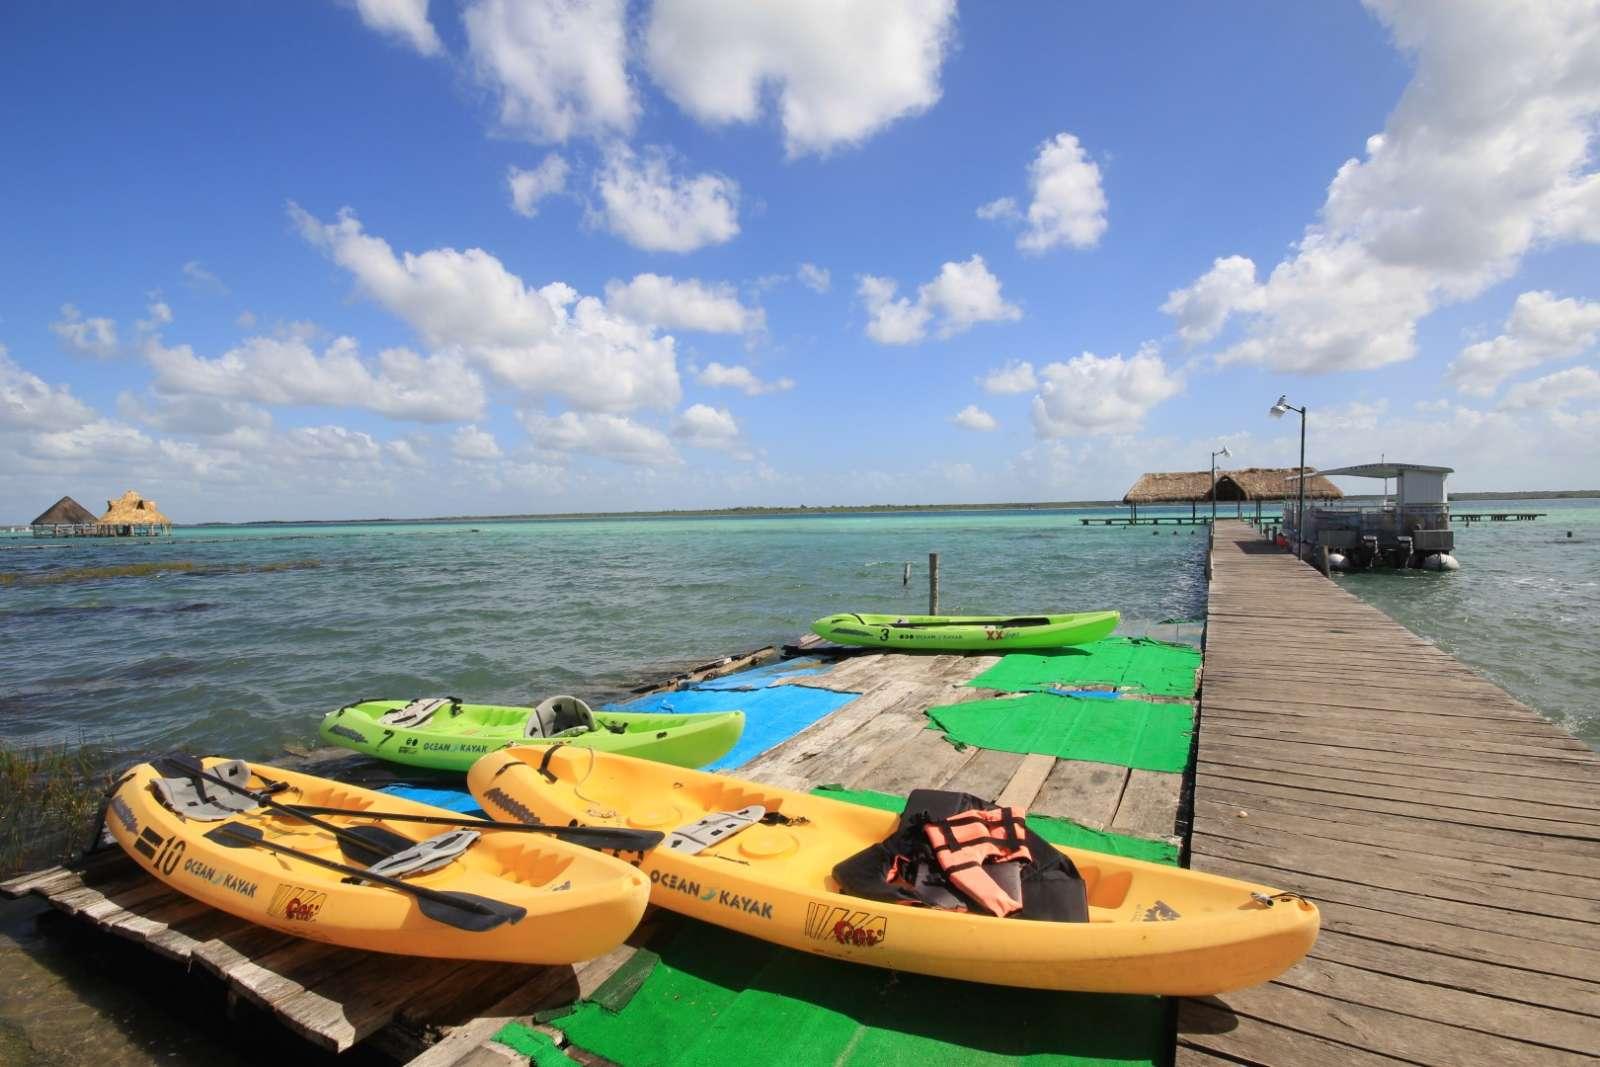 Kayaks on jetty at Laguna Bacalar